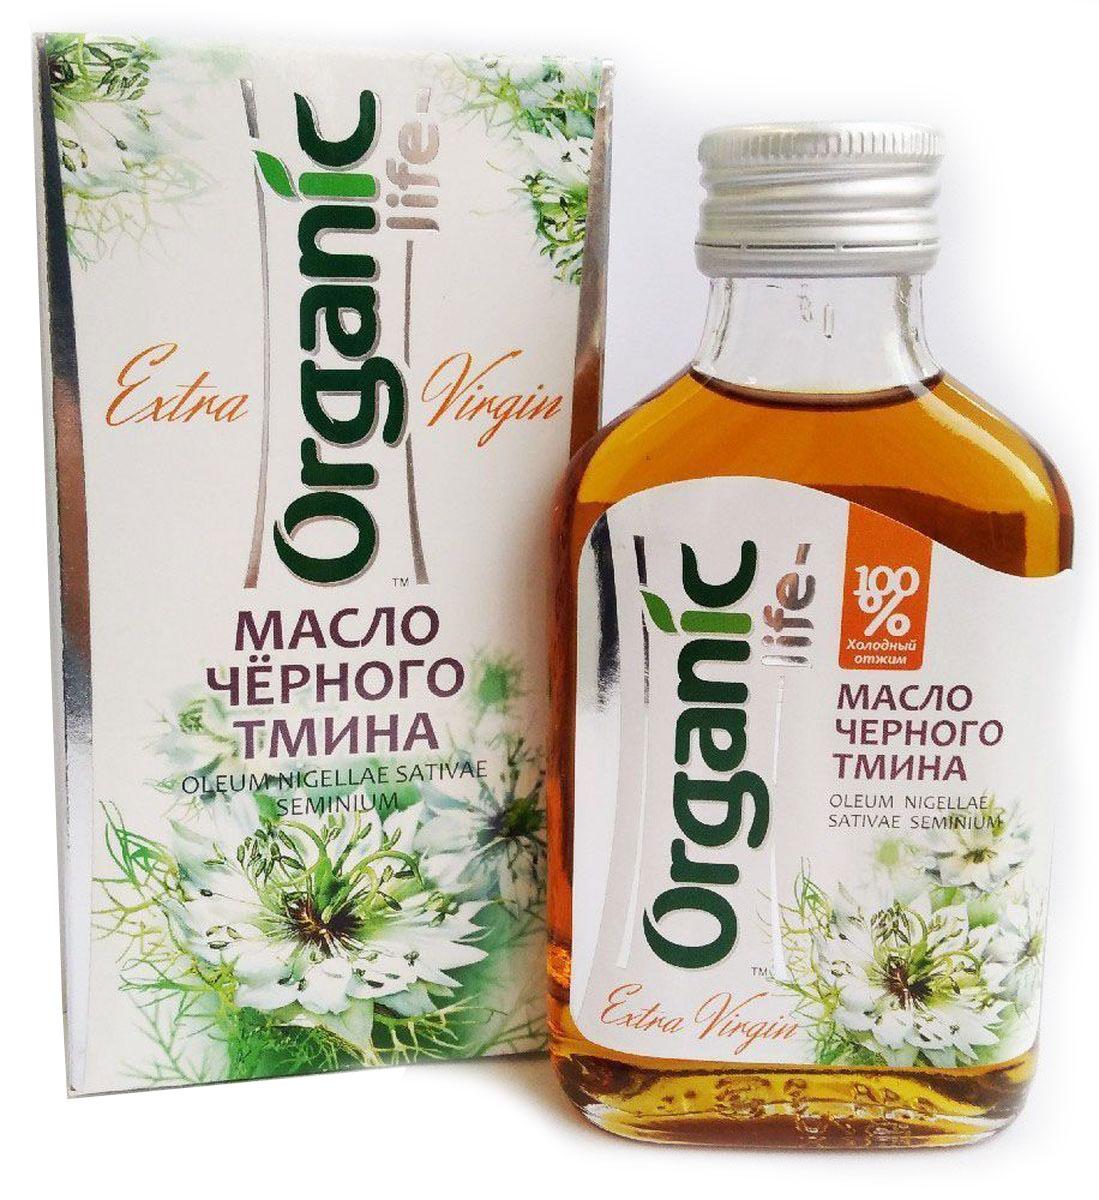 Organic Life масло черного тмина, 100 мл 212034